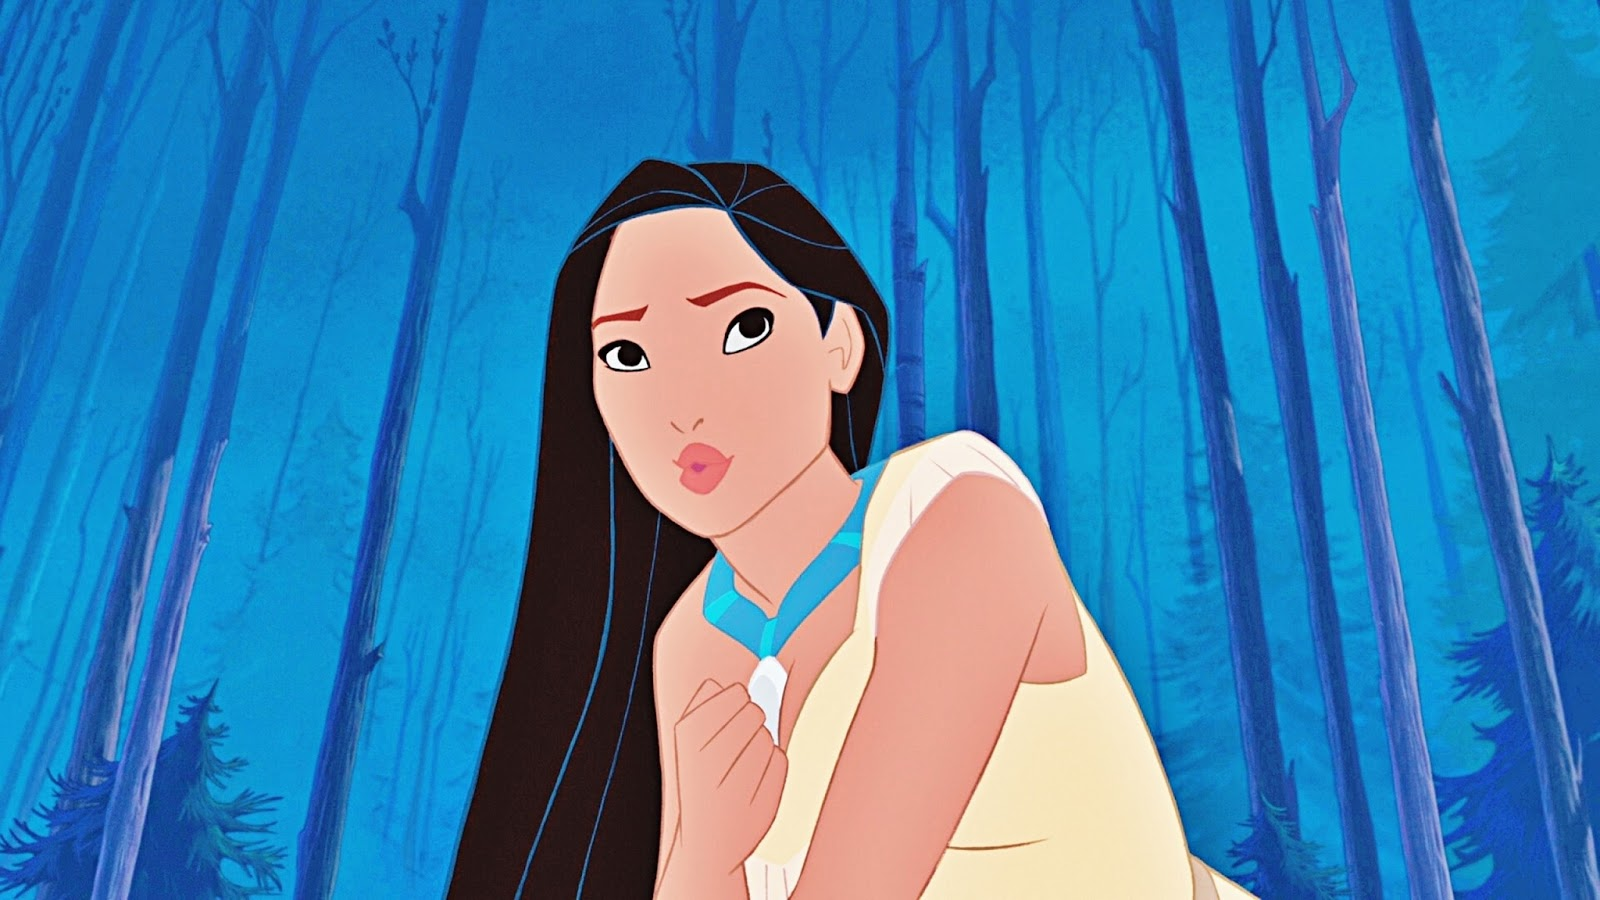 Latest Endeavor: Animated Disney Challenge